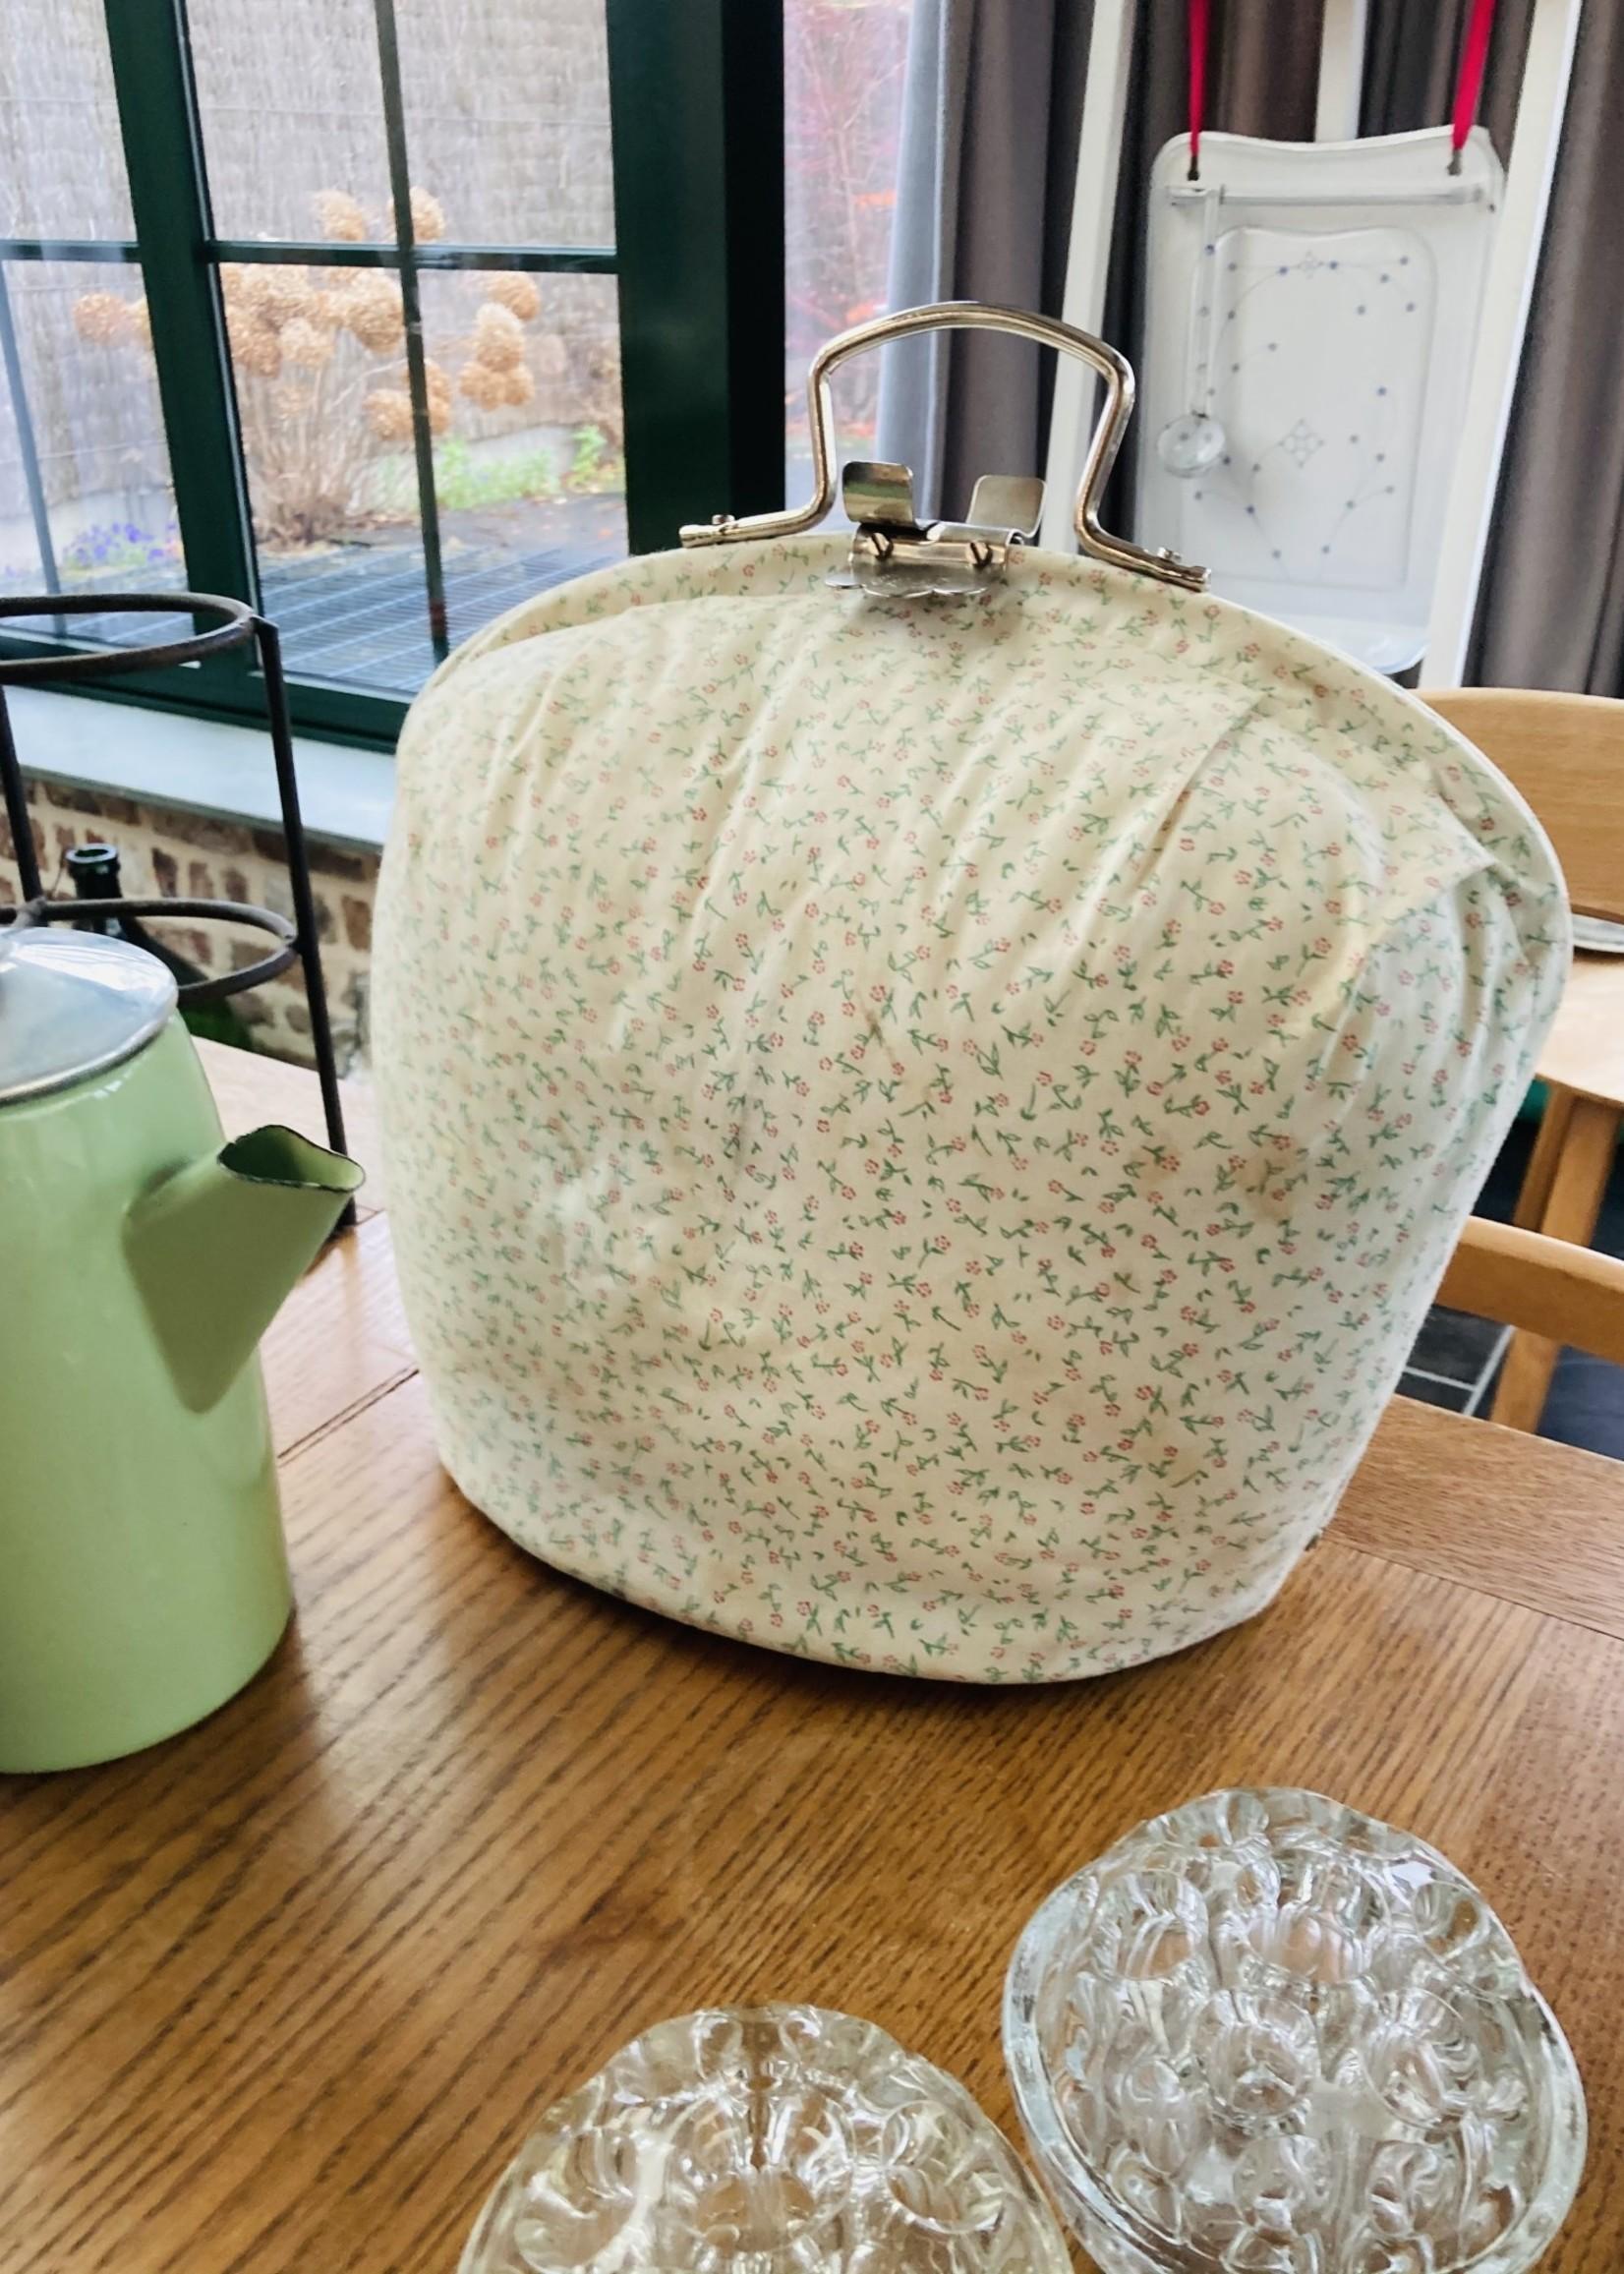 Douwe Egberts Vintage Teapot Hat